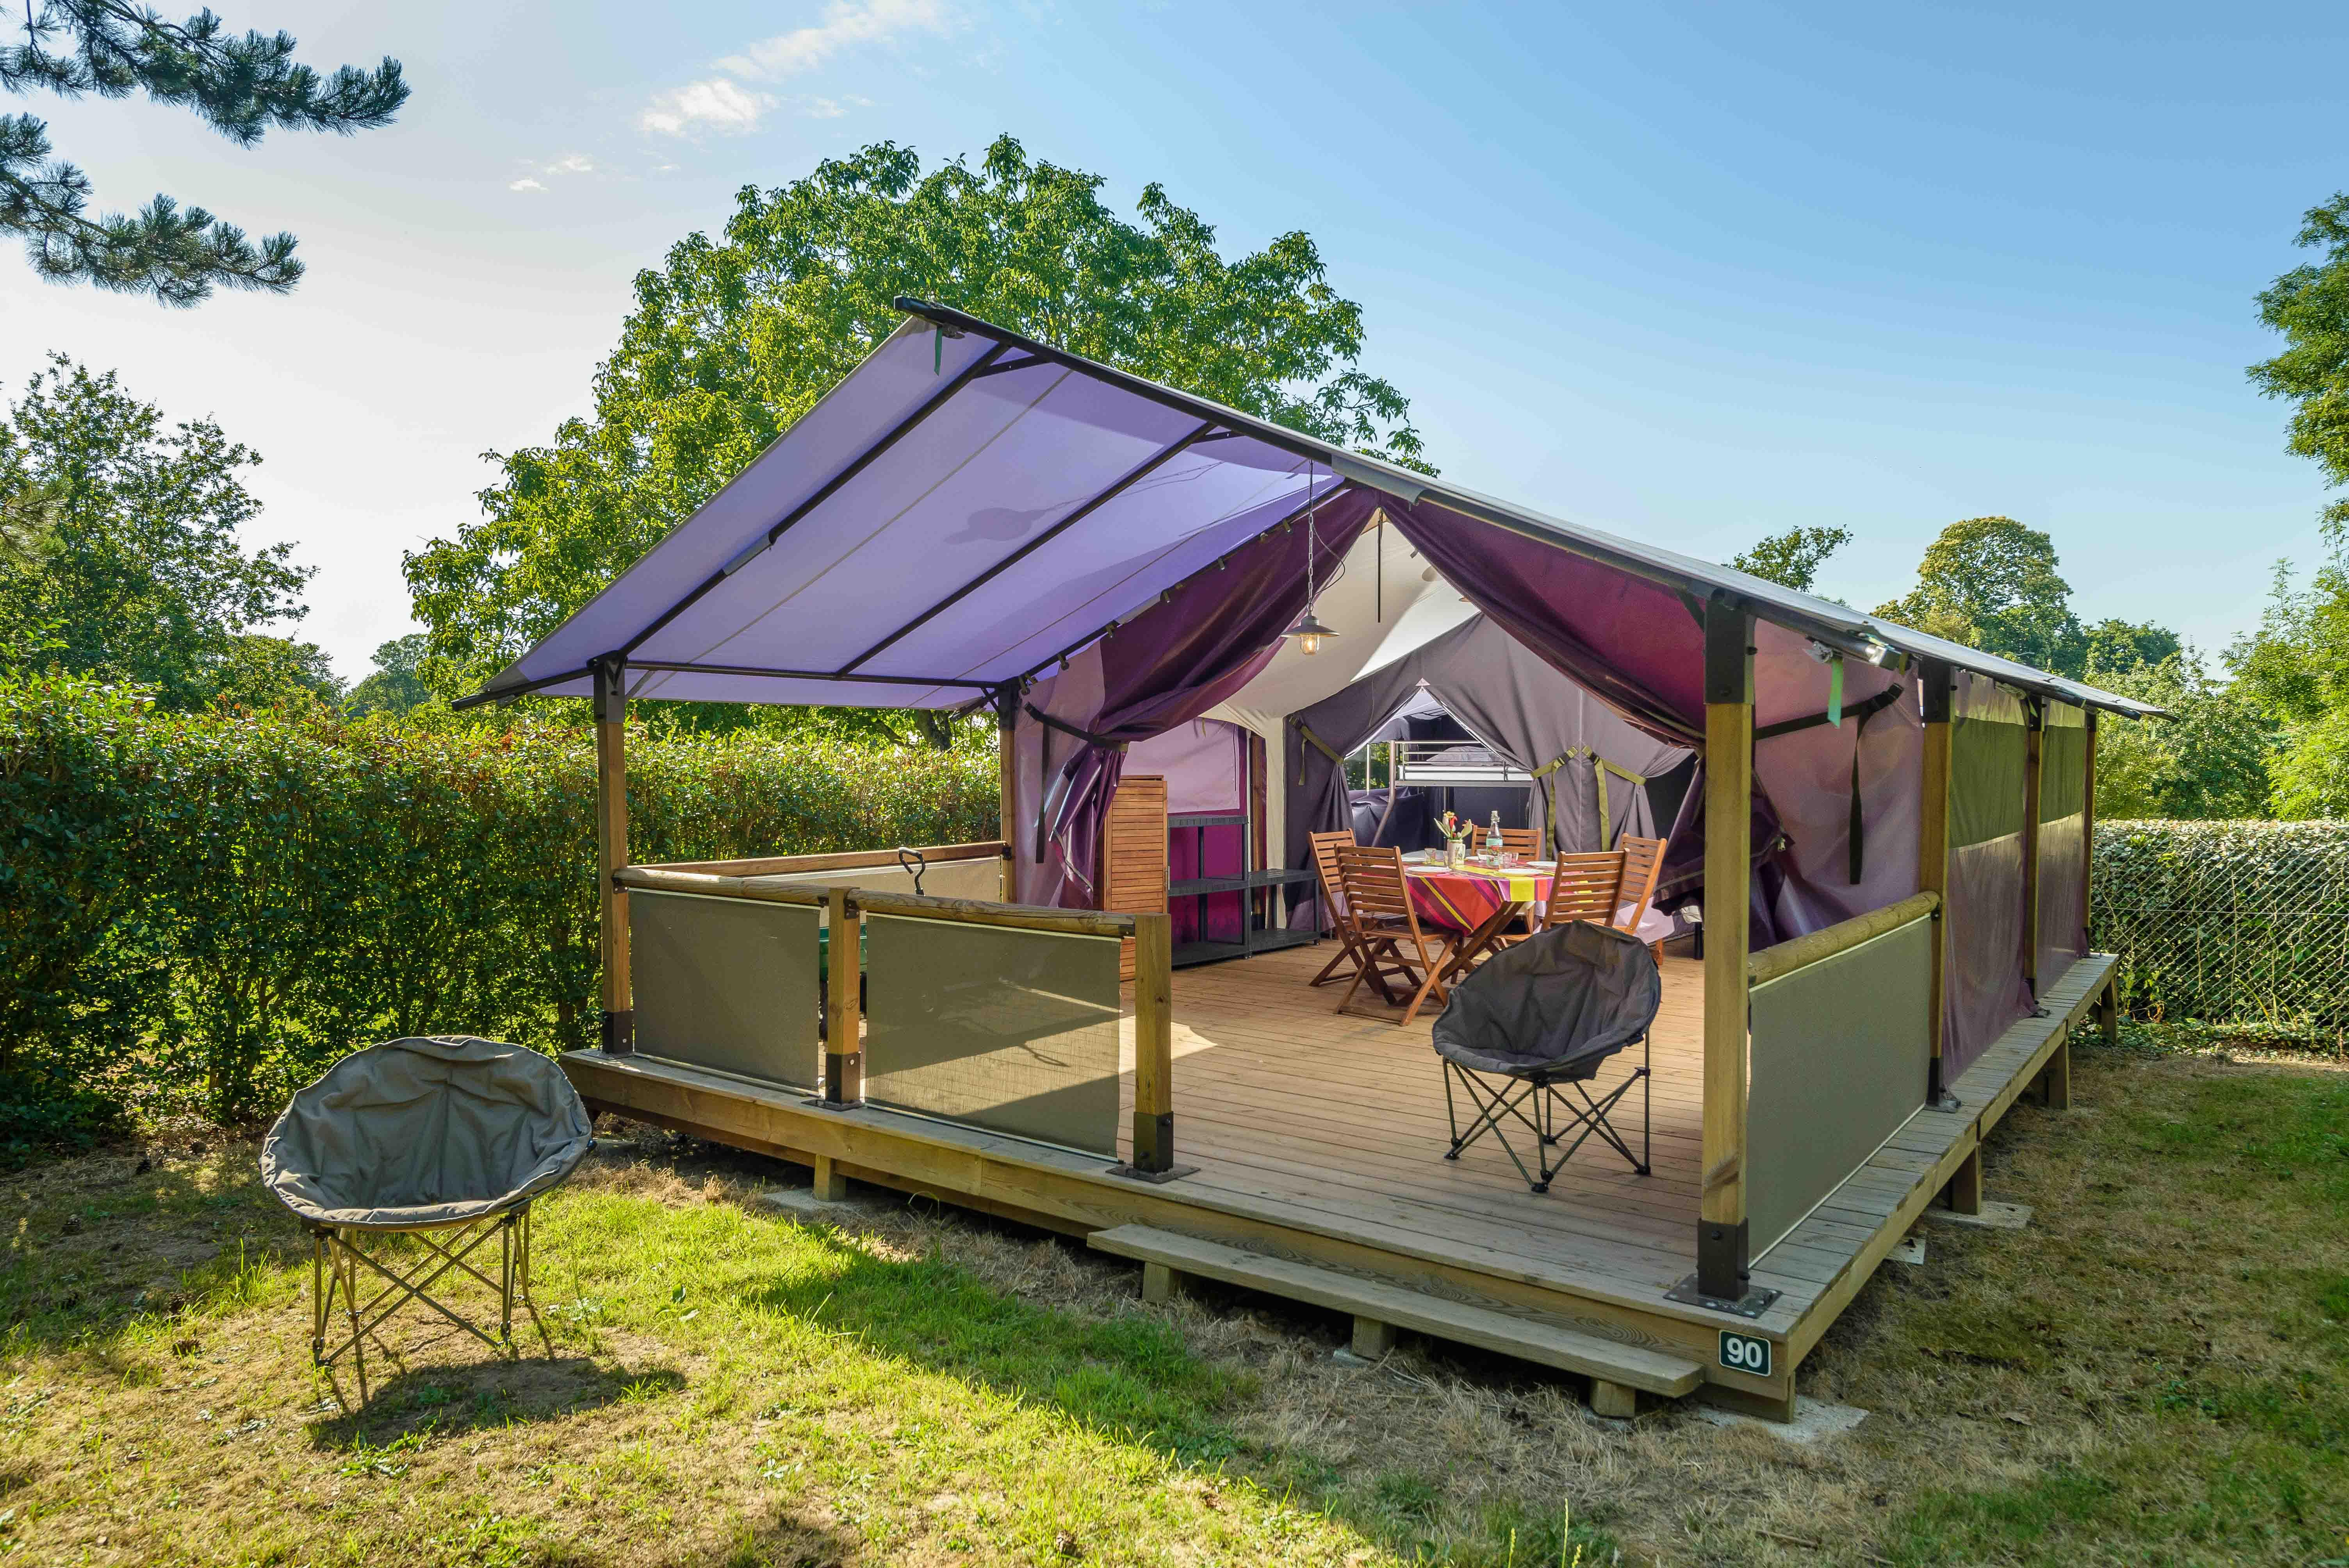 Location - Bungalow Freeflower 37M² (2 Chambres) Terrasse Couverte 13M² - Sans Sanitaires - - Flower Camping Le Kergariou